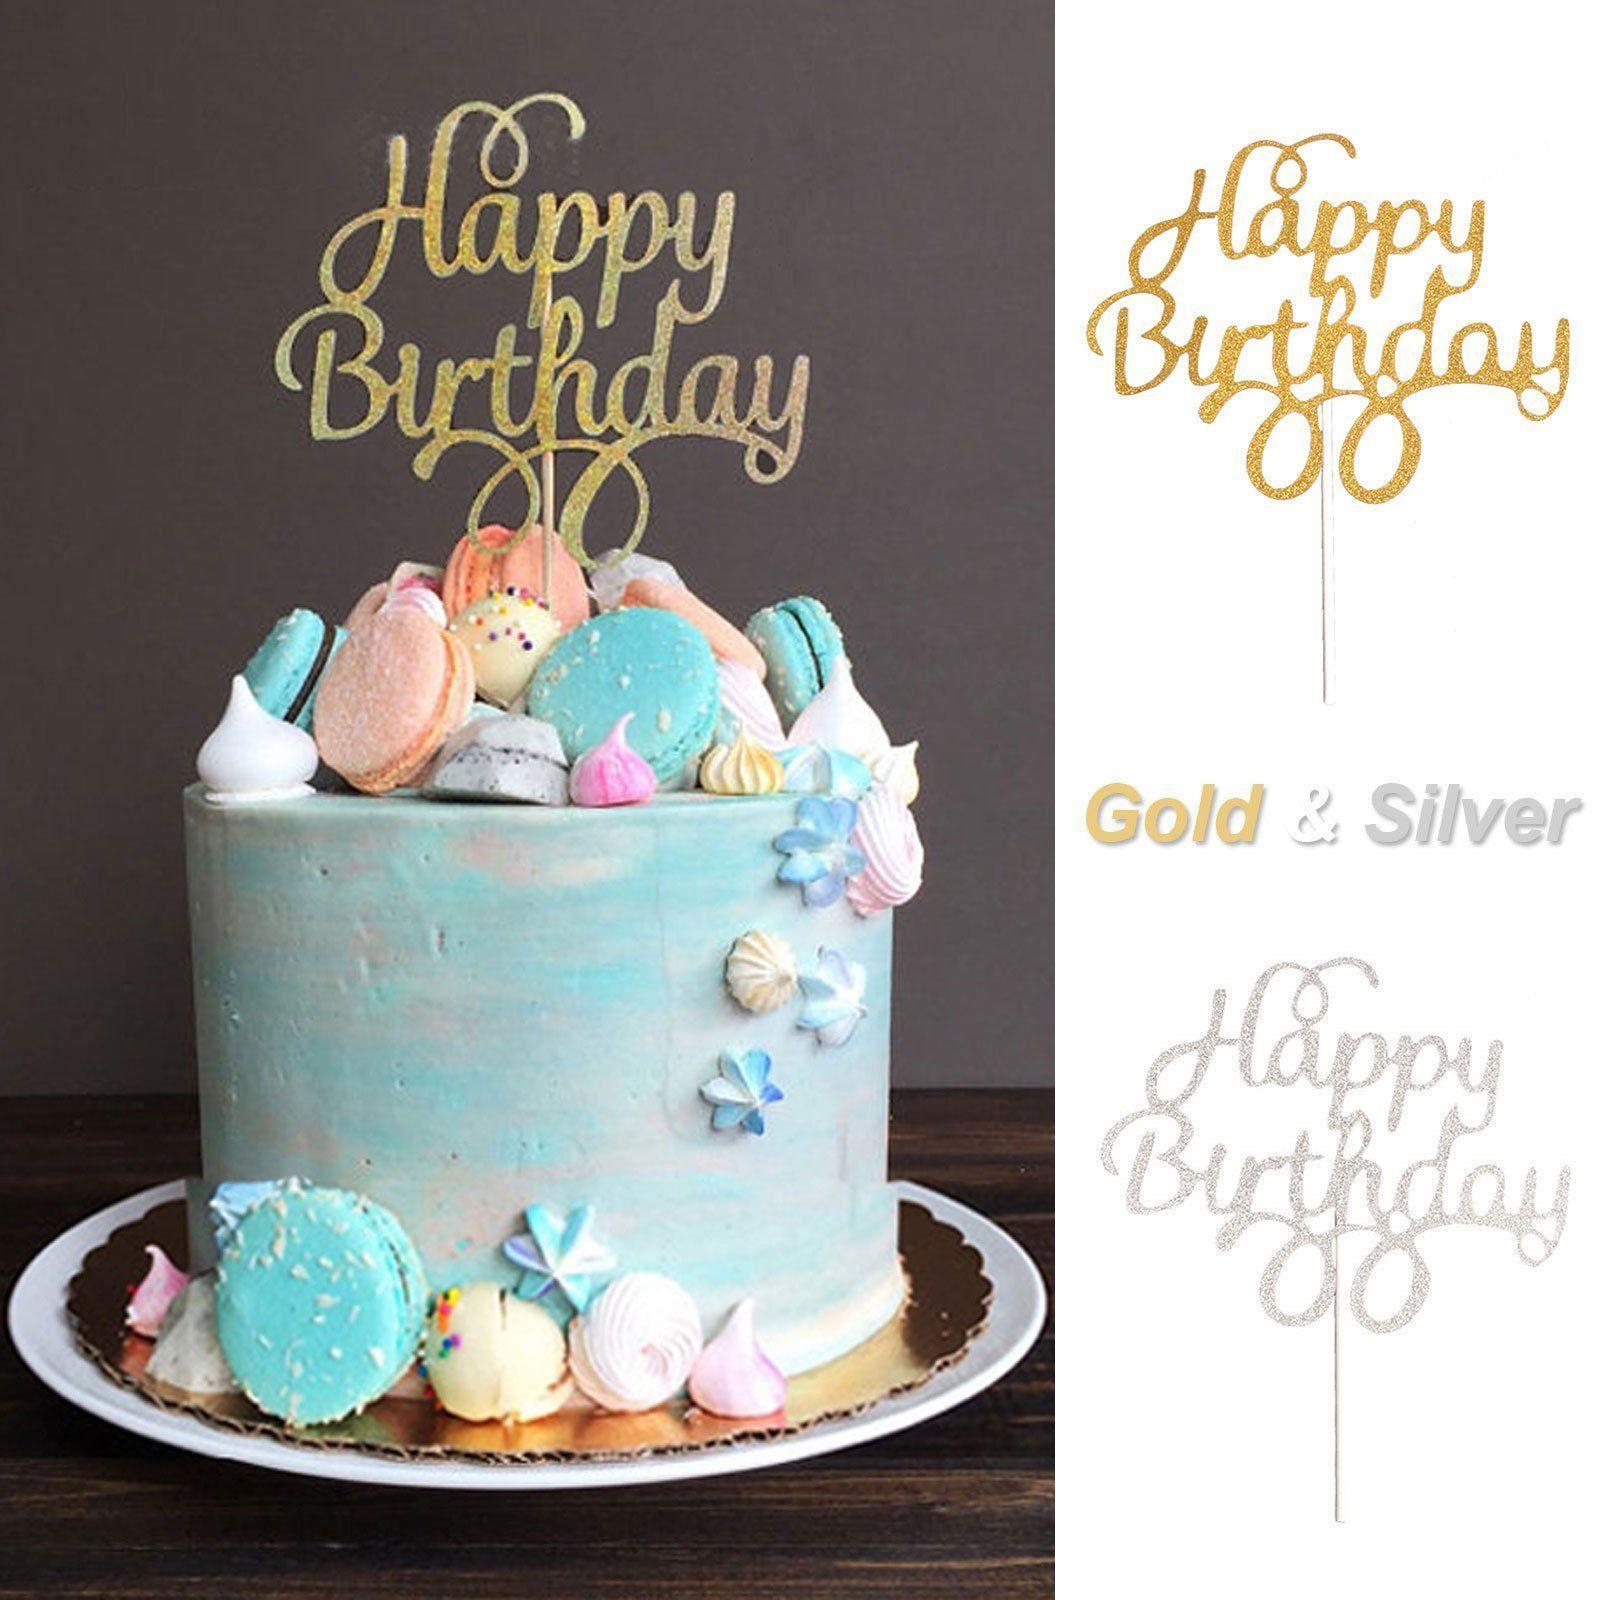 Happy Birthday Cake Topper Black Gold Silver Glitter Party Decorating Diy Eb